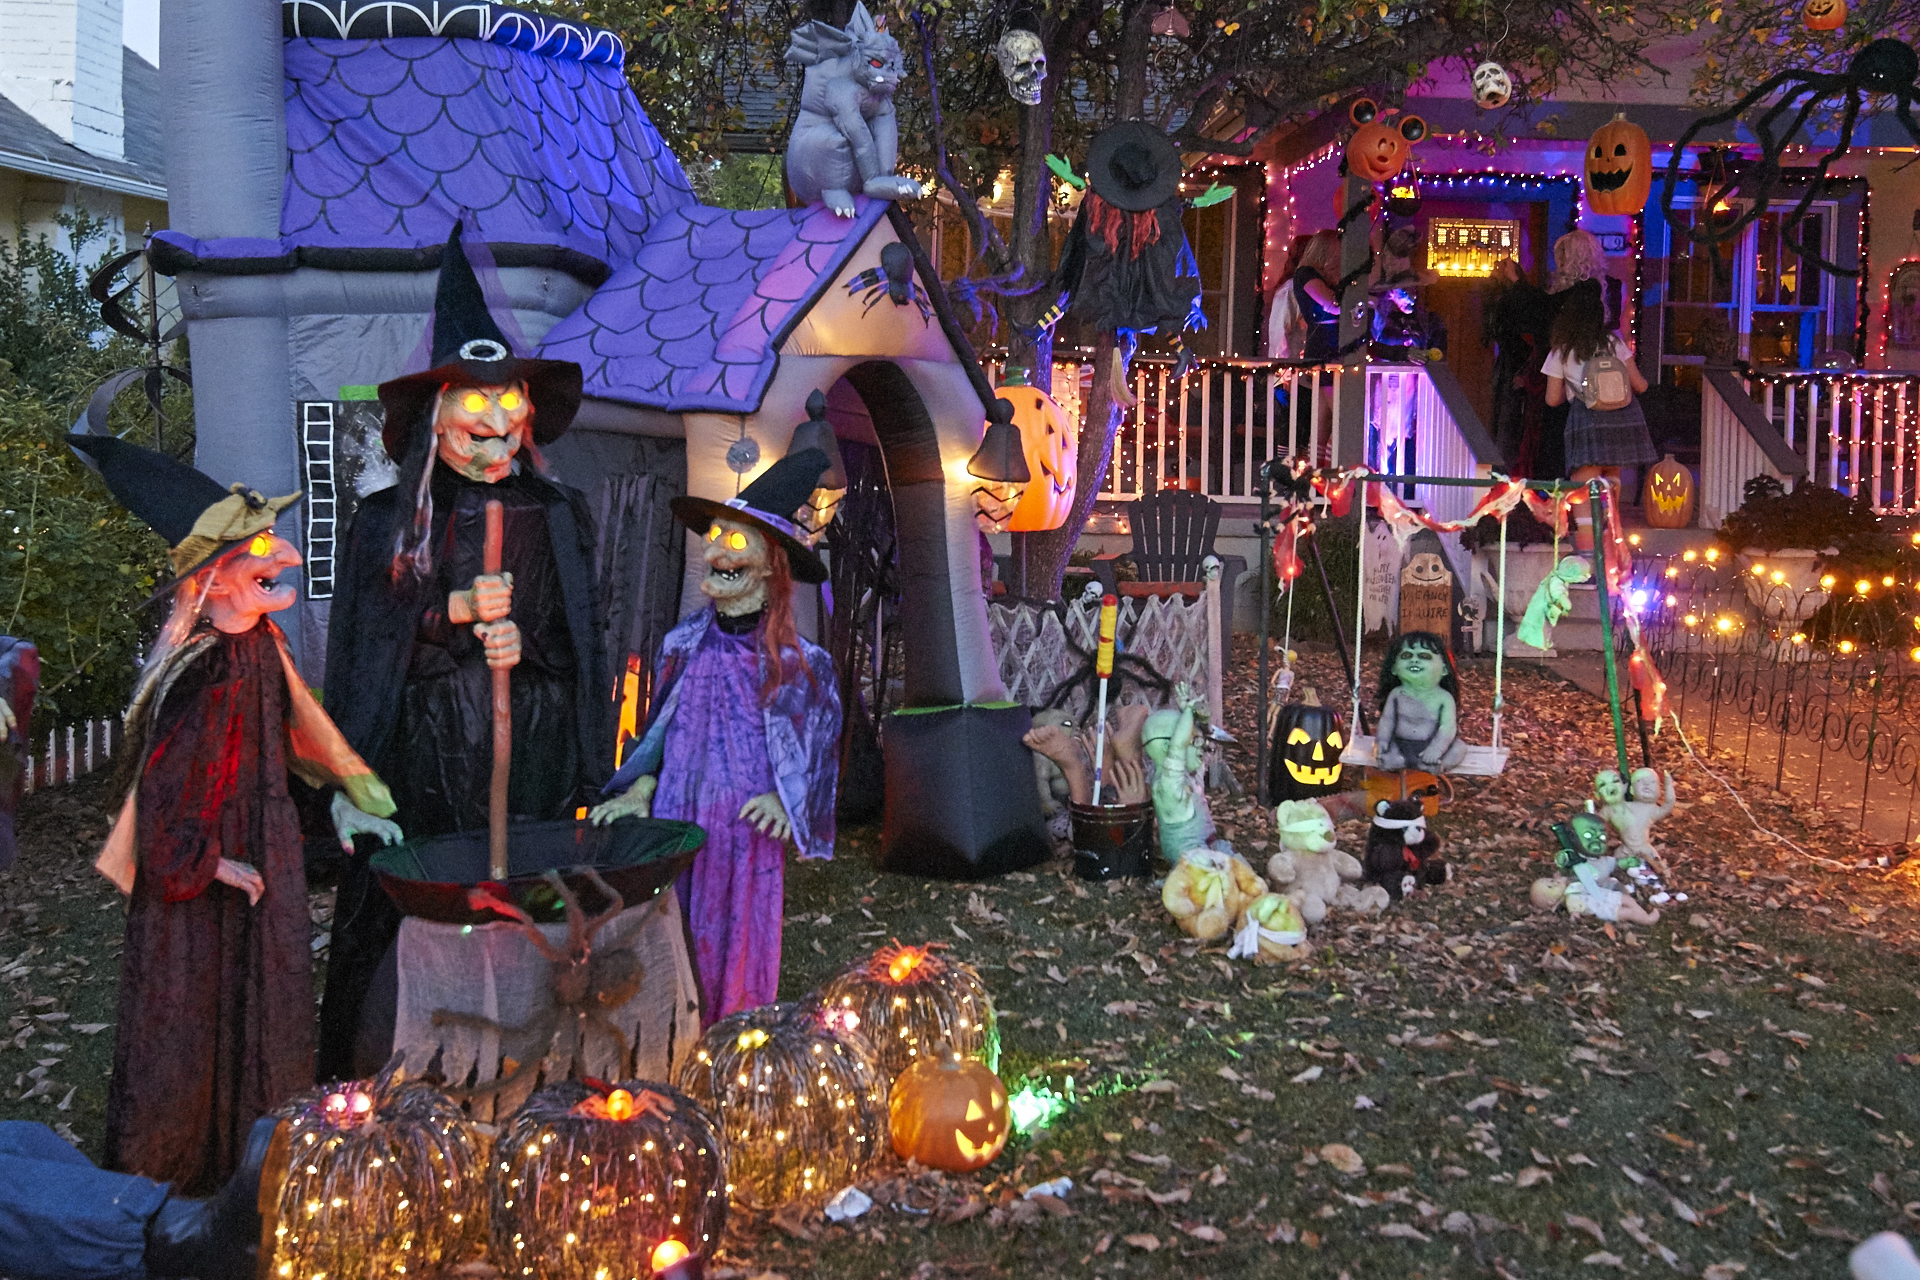 Prescott Arizona Halloween Events 2020 Four Fun Things to Do for Halloween in Prescott   Crystal Creek